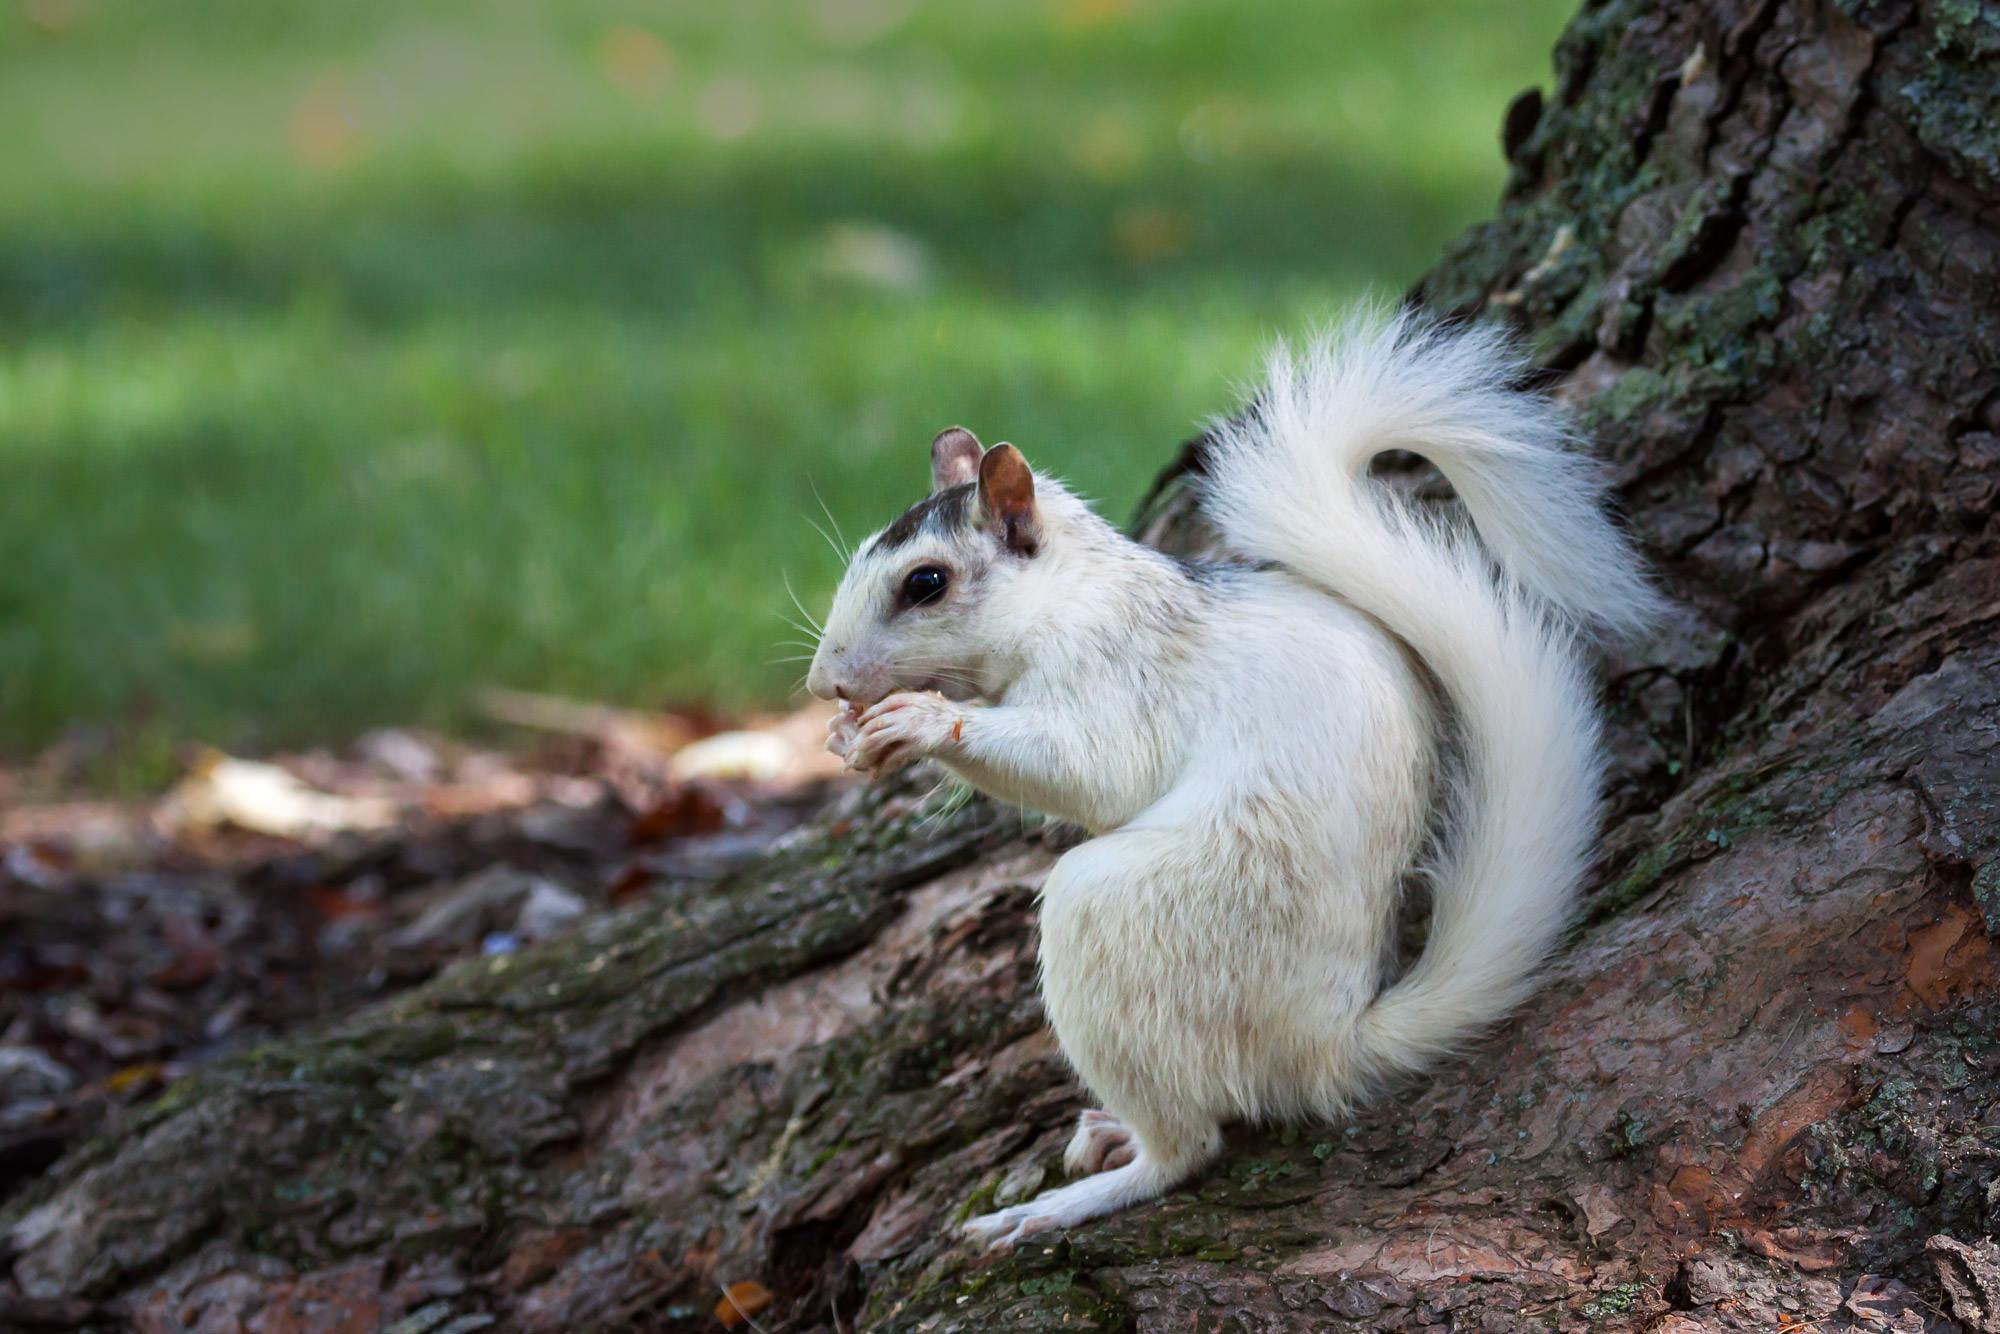 White Squirrel, North Carolina, Pisgah, limited edition, photograph, fine art, wildlife, photo